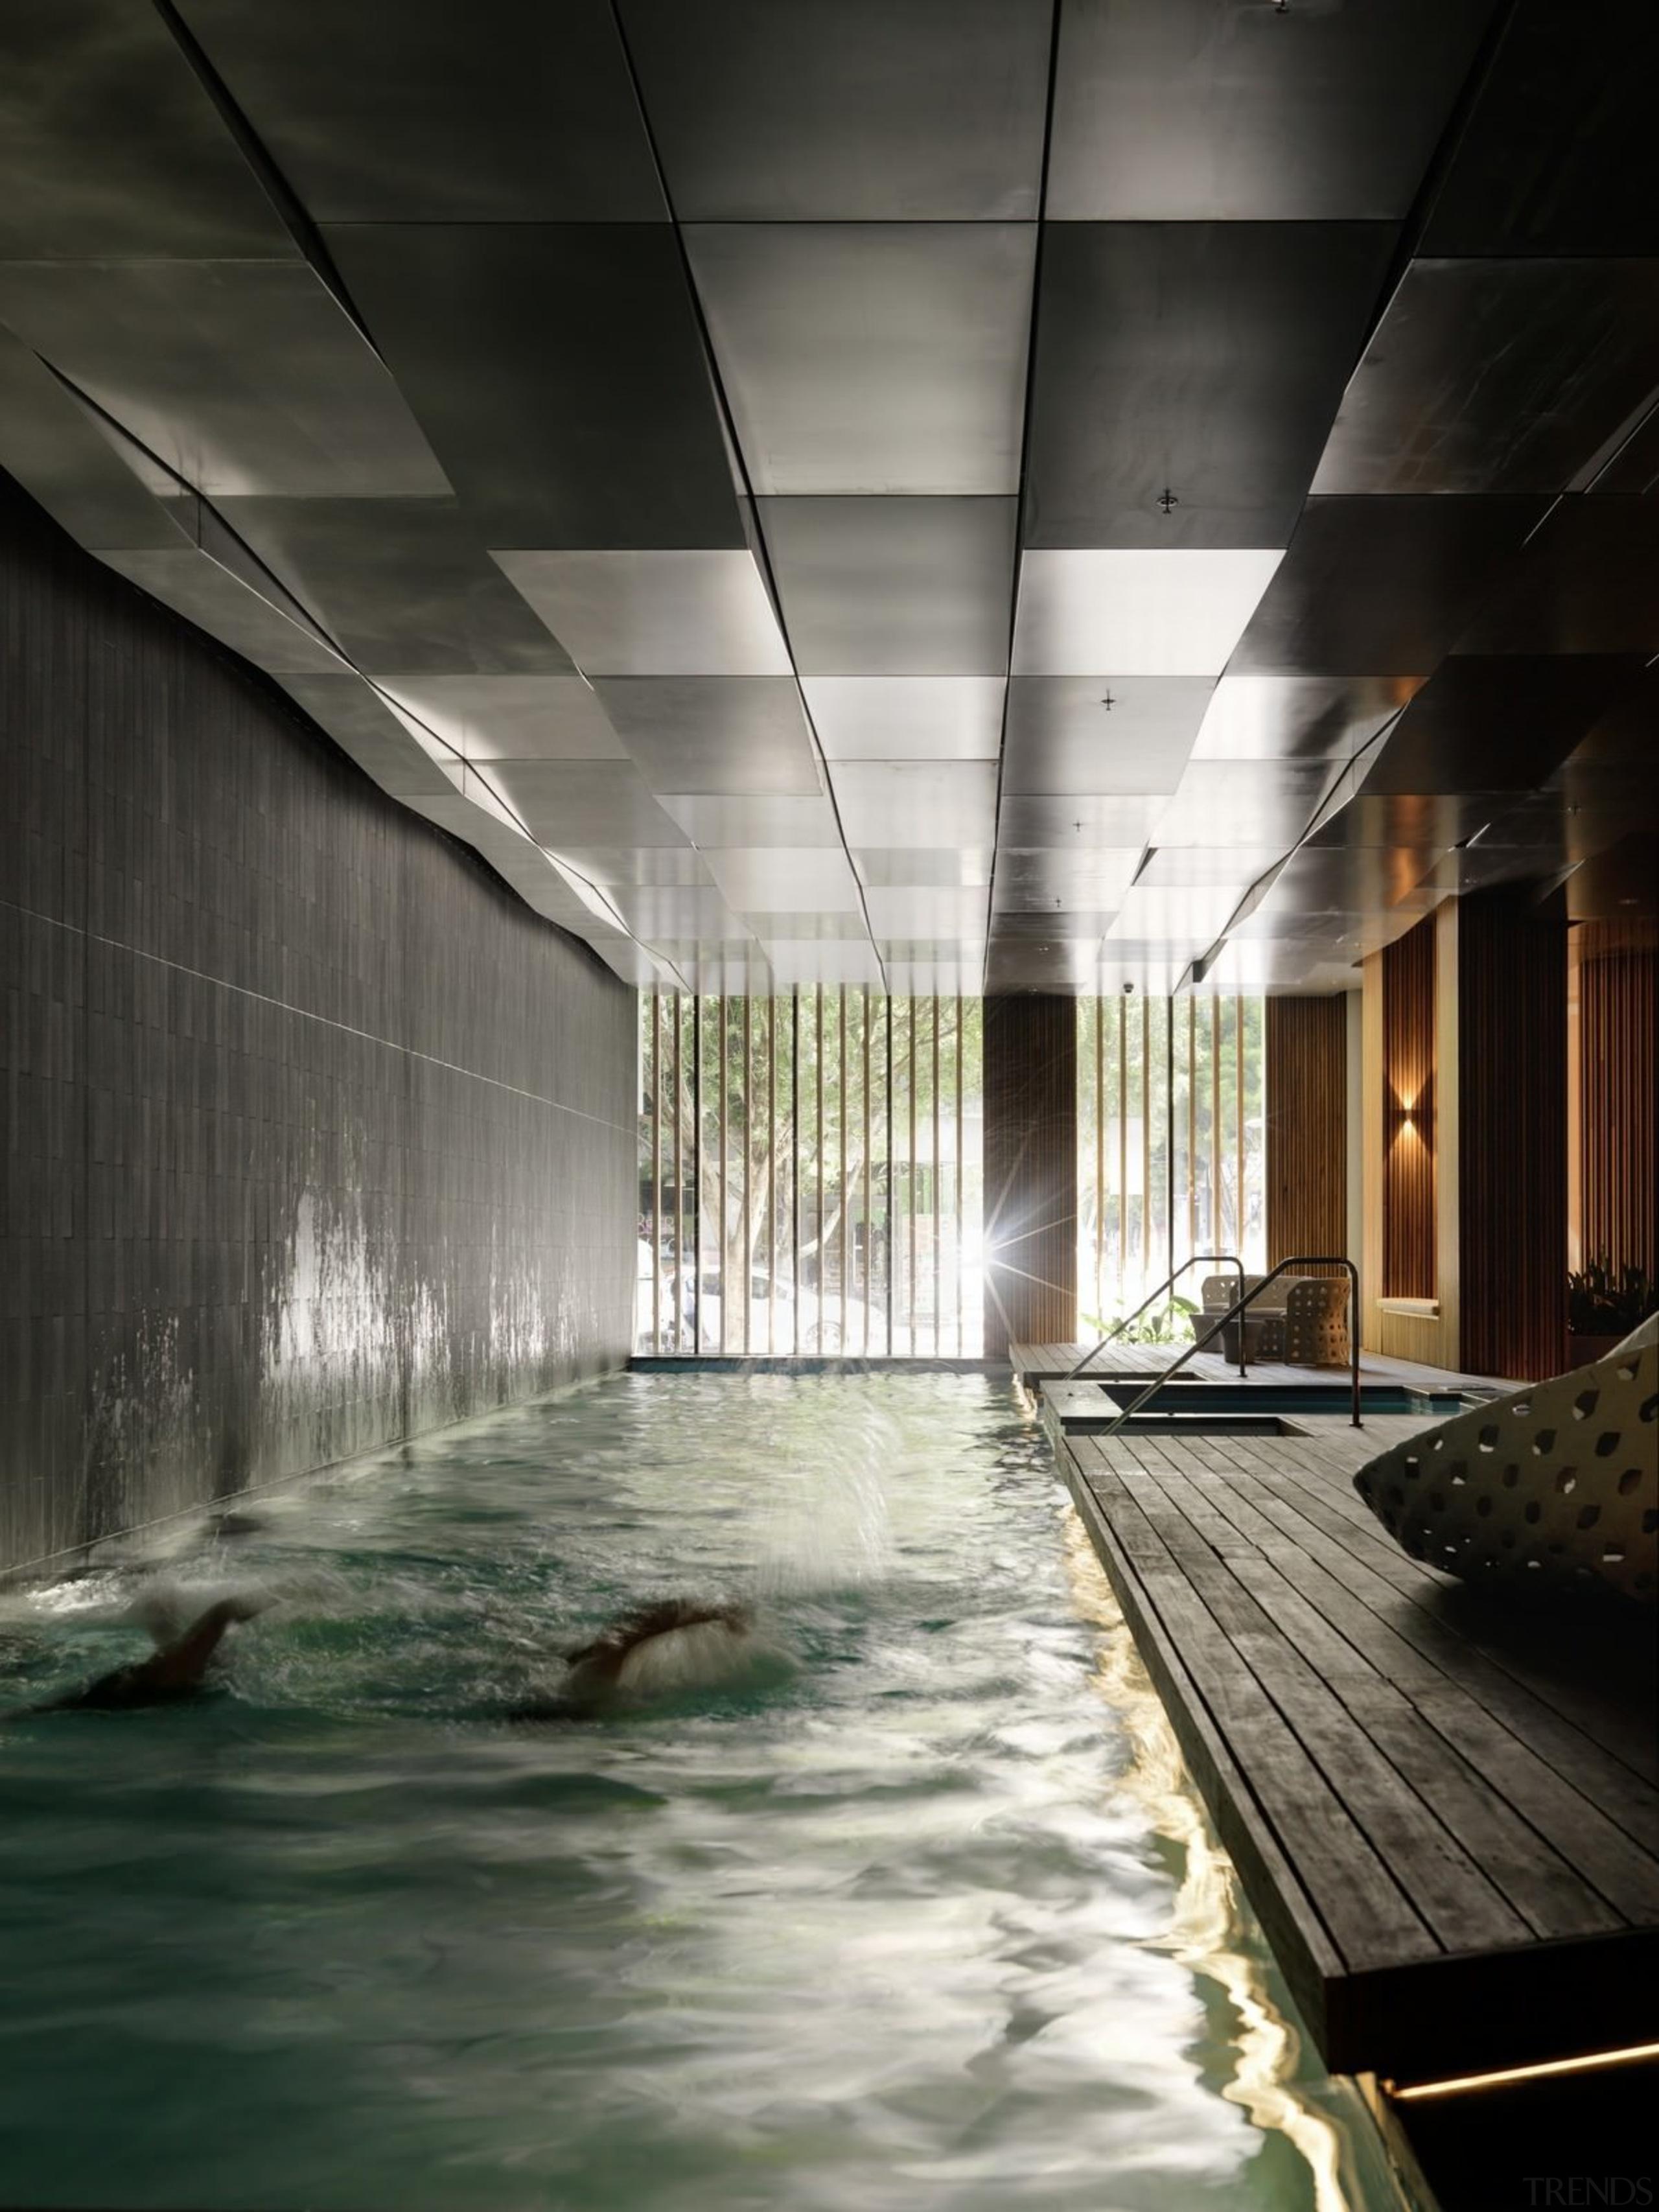 Promenade Aqui by Woods Bagot - Promenade Aqui architecture, ceiling, daylighting, reflection, water, black, gray